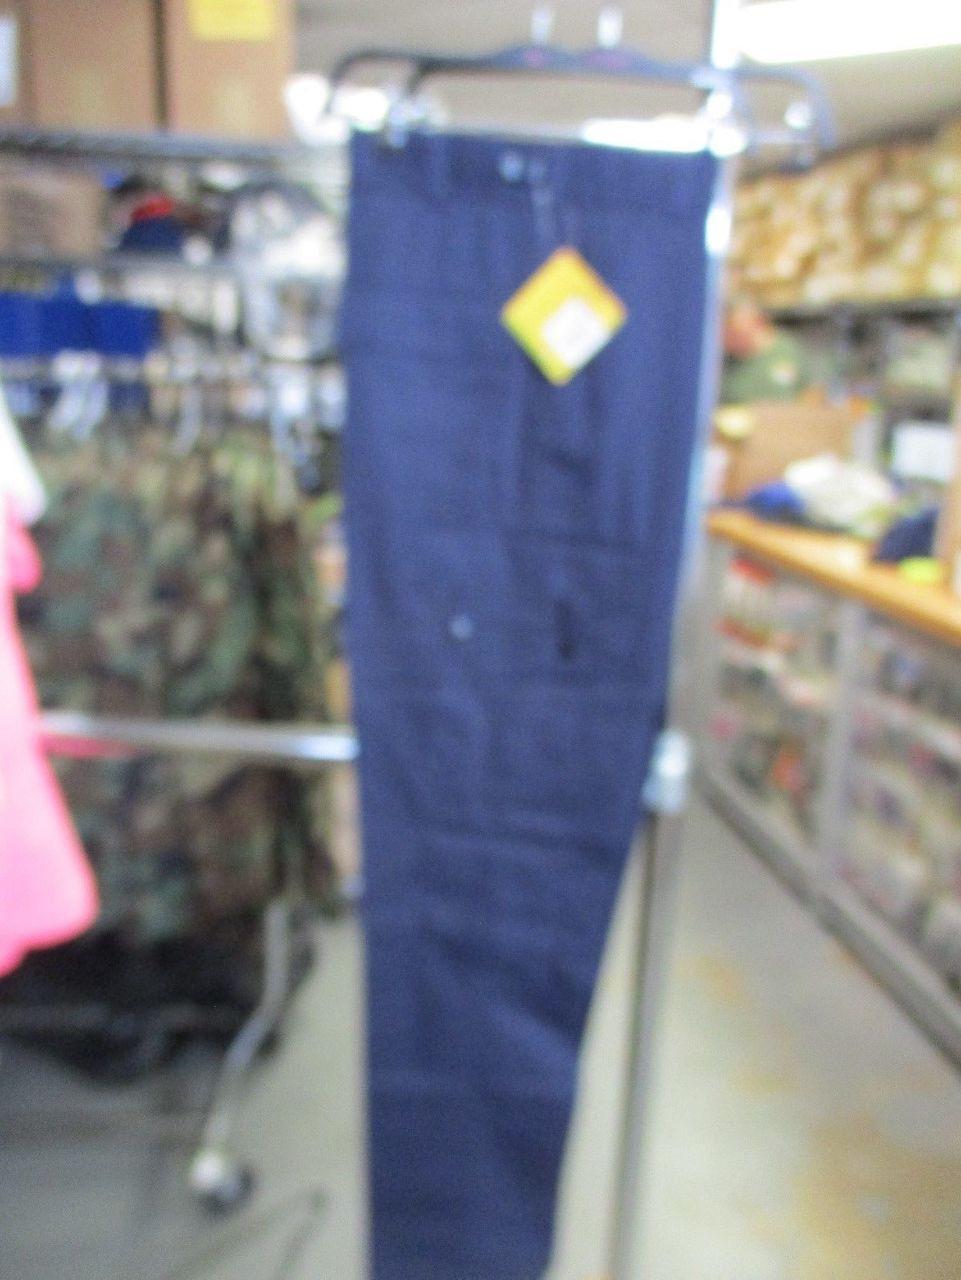 ROTHCO EMT   EMS Uniform Cargo Pants 9 Pocket -STYLE  7820 NAVY BLUE ... c70374b4b07